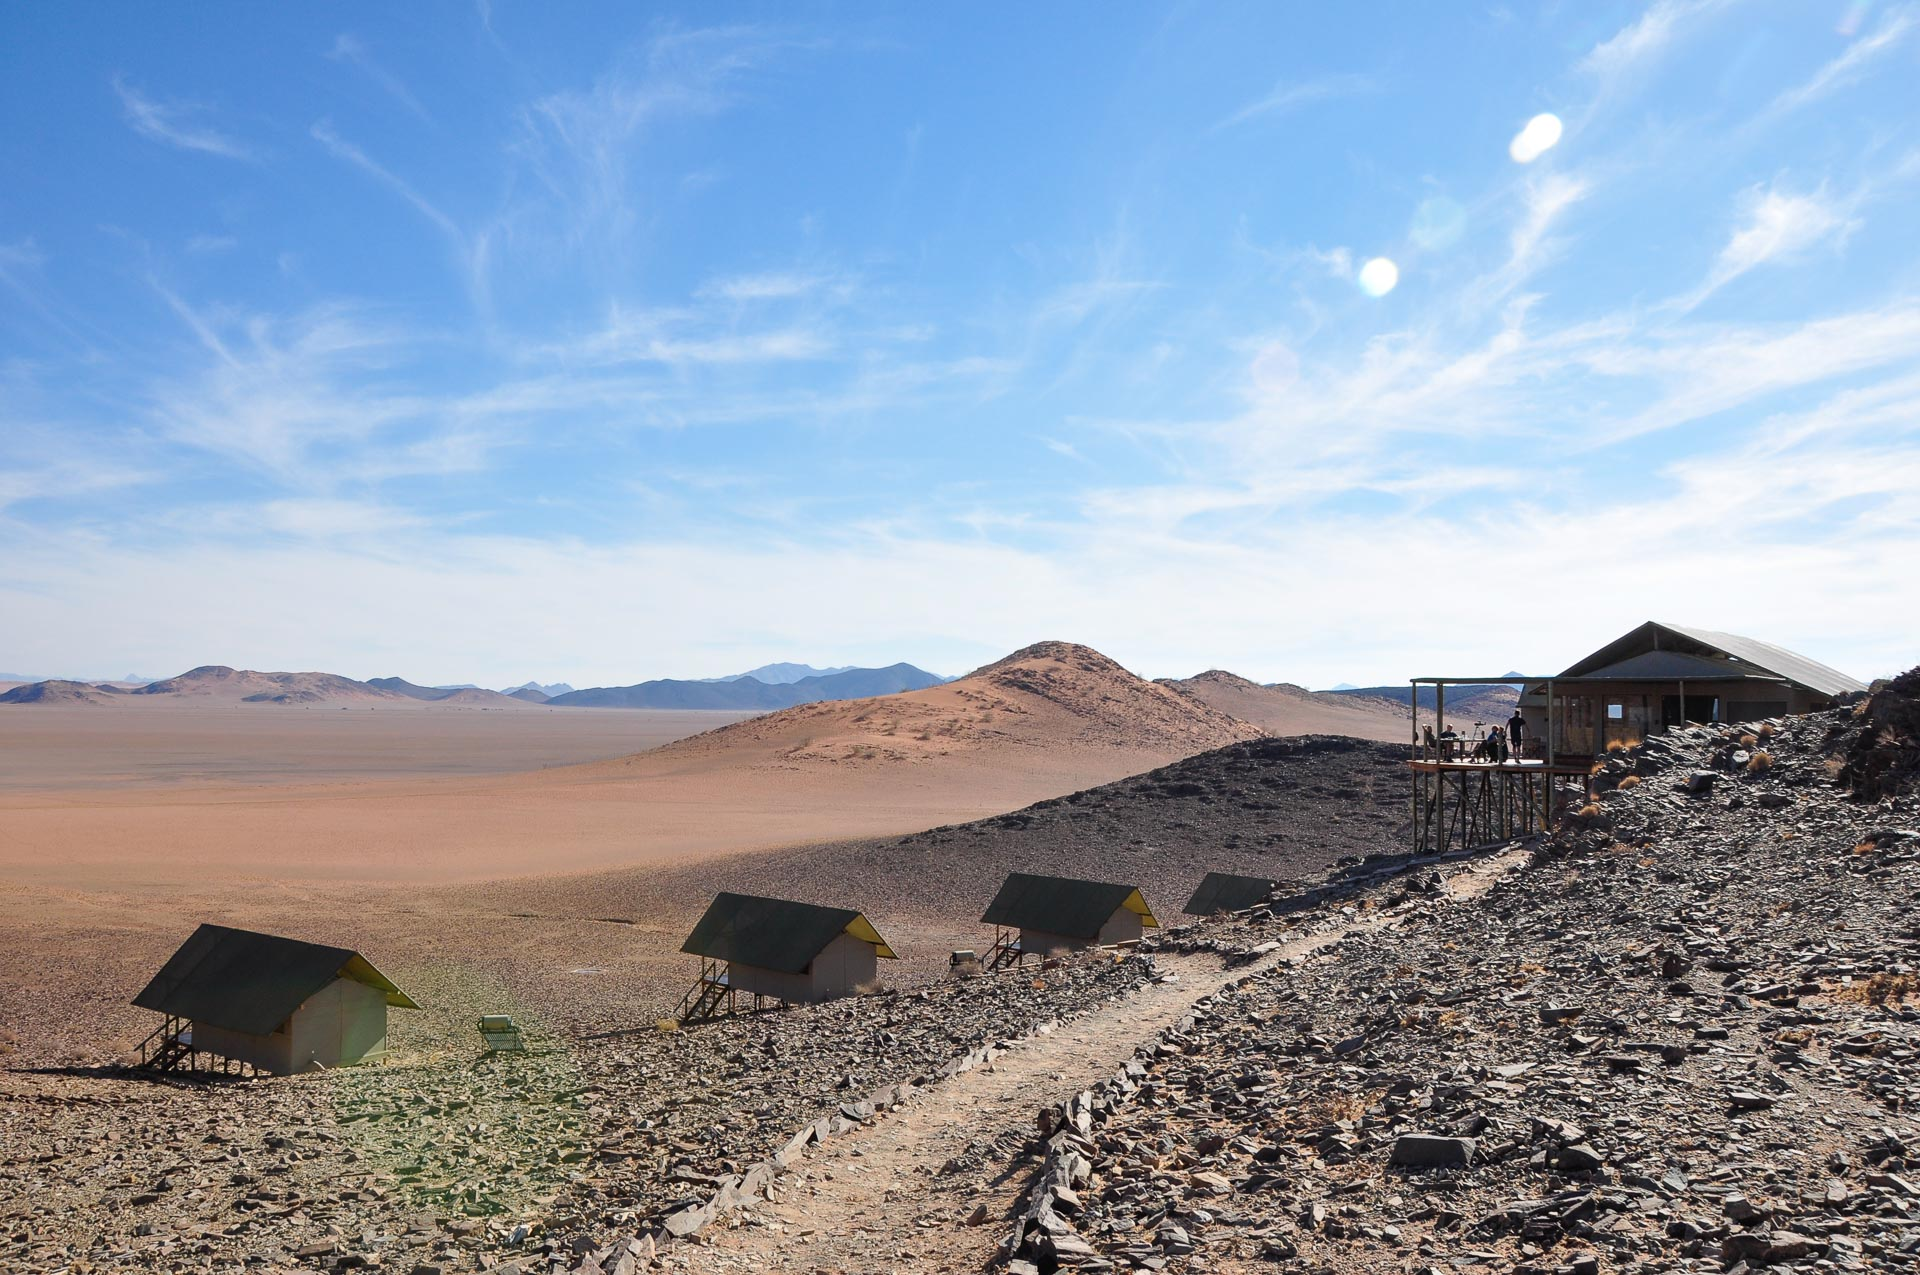 Kanaan-Desert-Retreat-Namibia-Globetrotter-Select-44